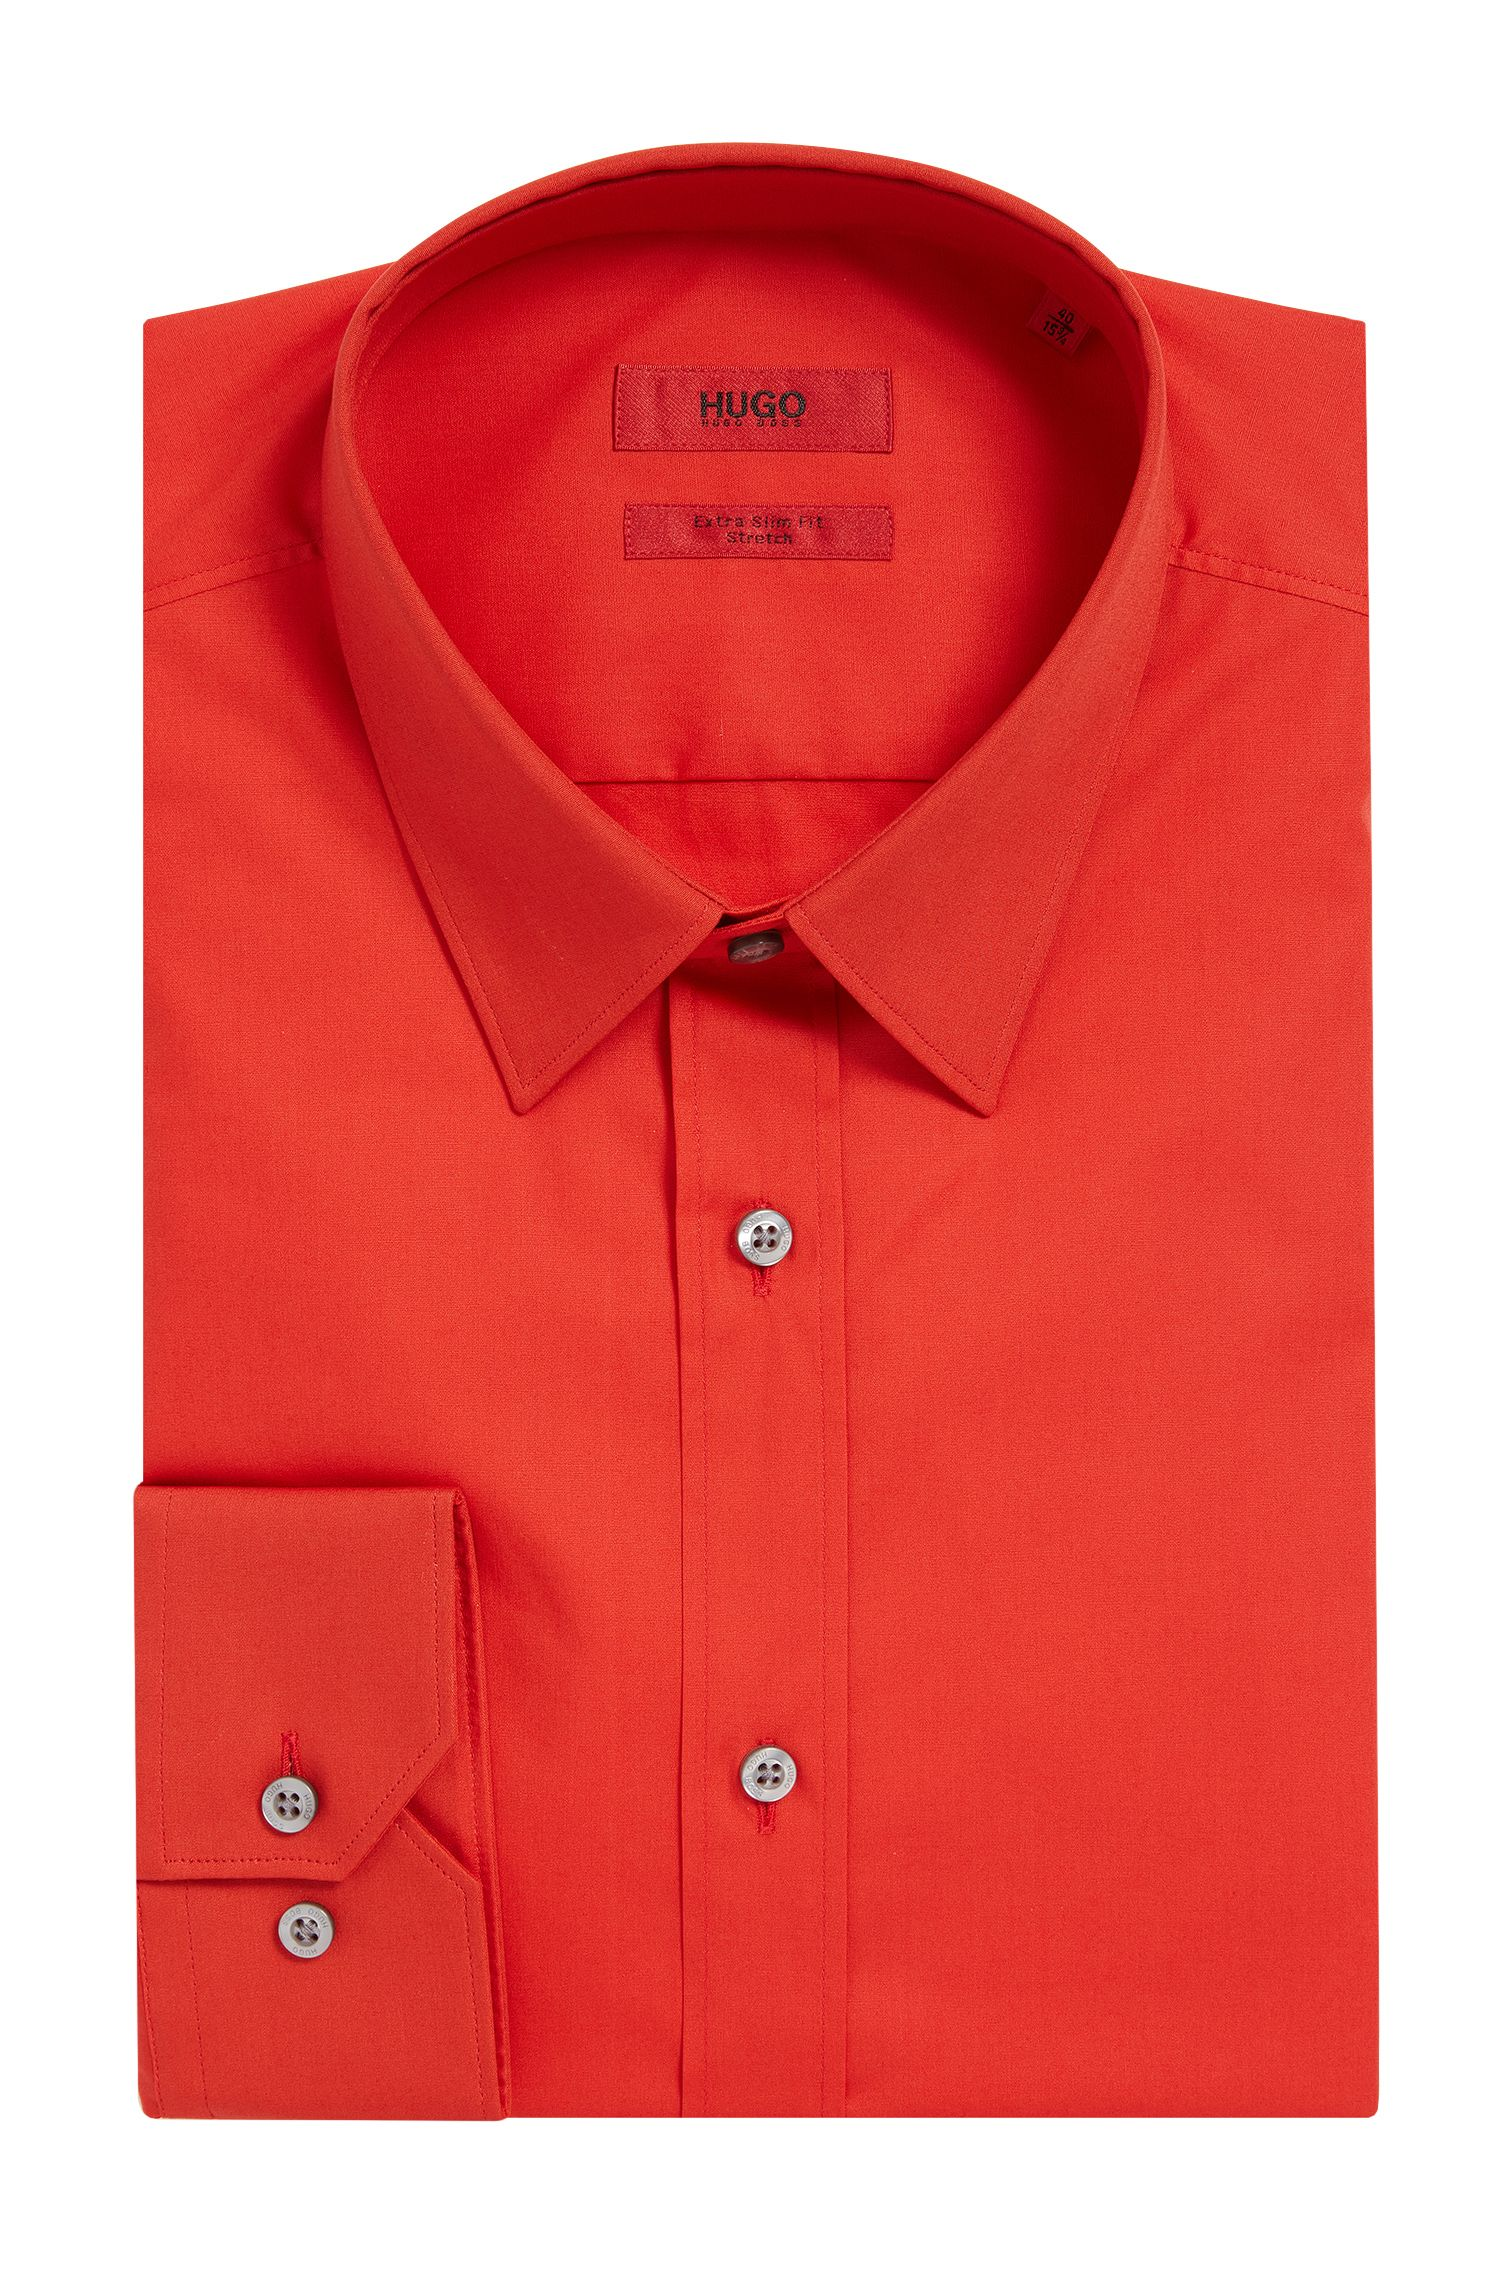 'Elisha' | Extra Slim Fit, Stretch Cotton Dress Shirt